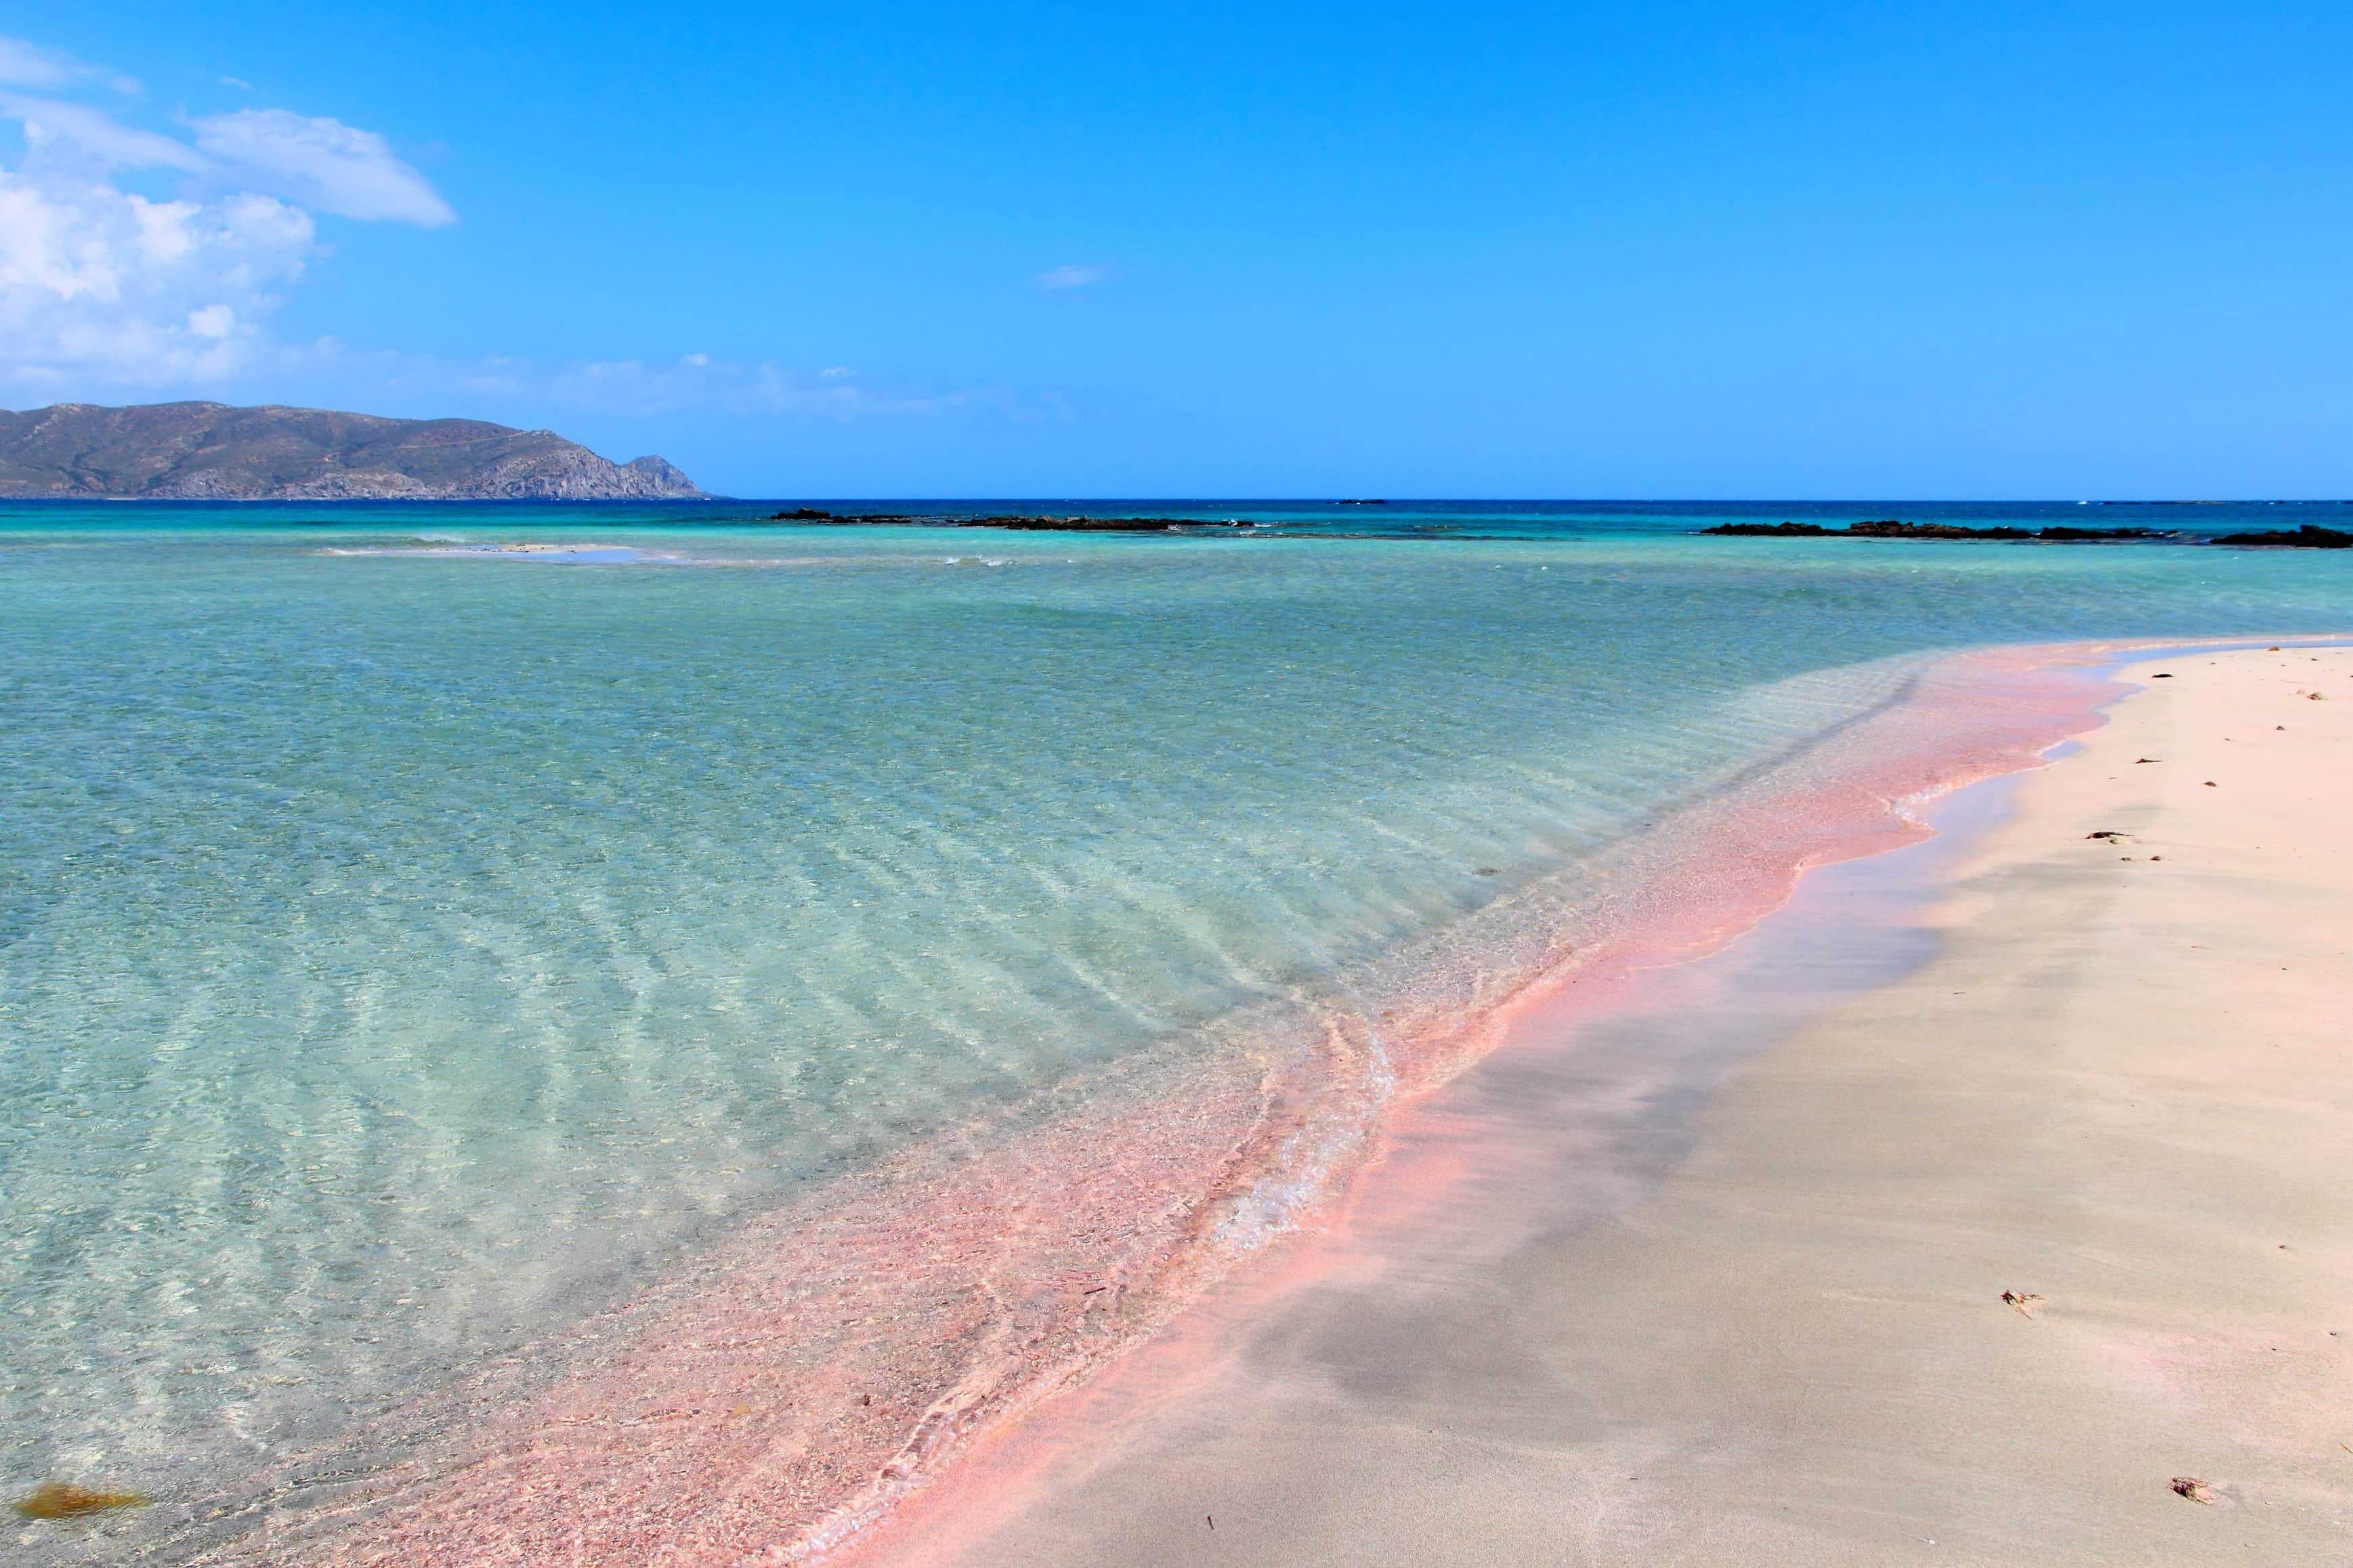 spiaggia  elafonissi1